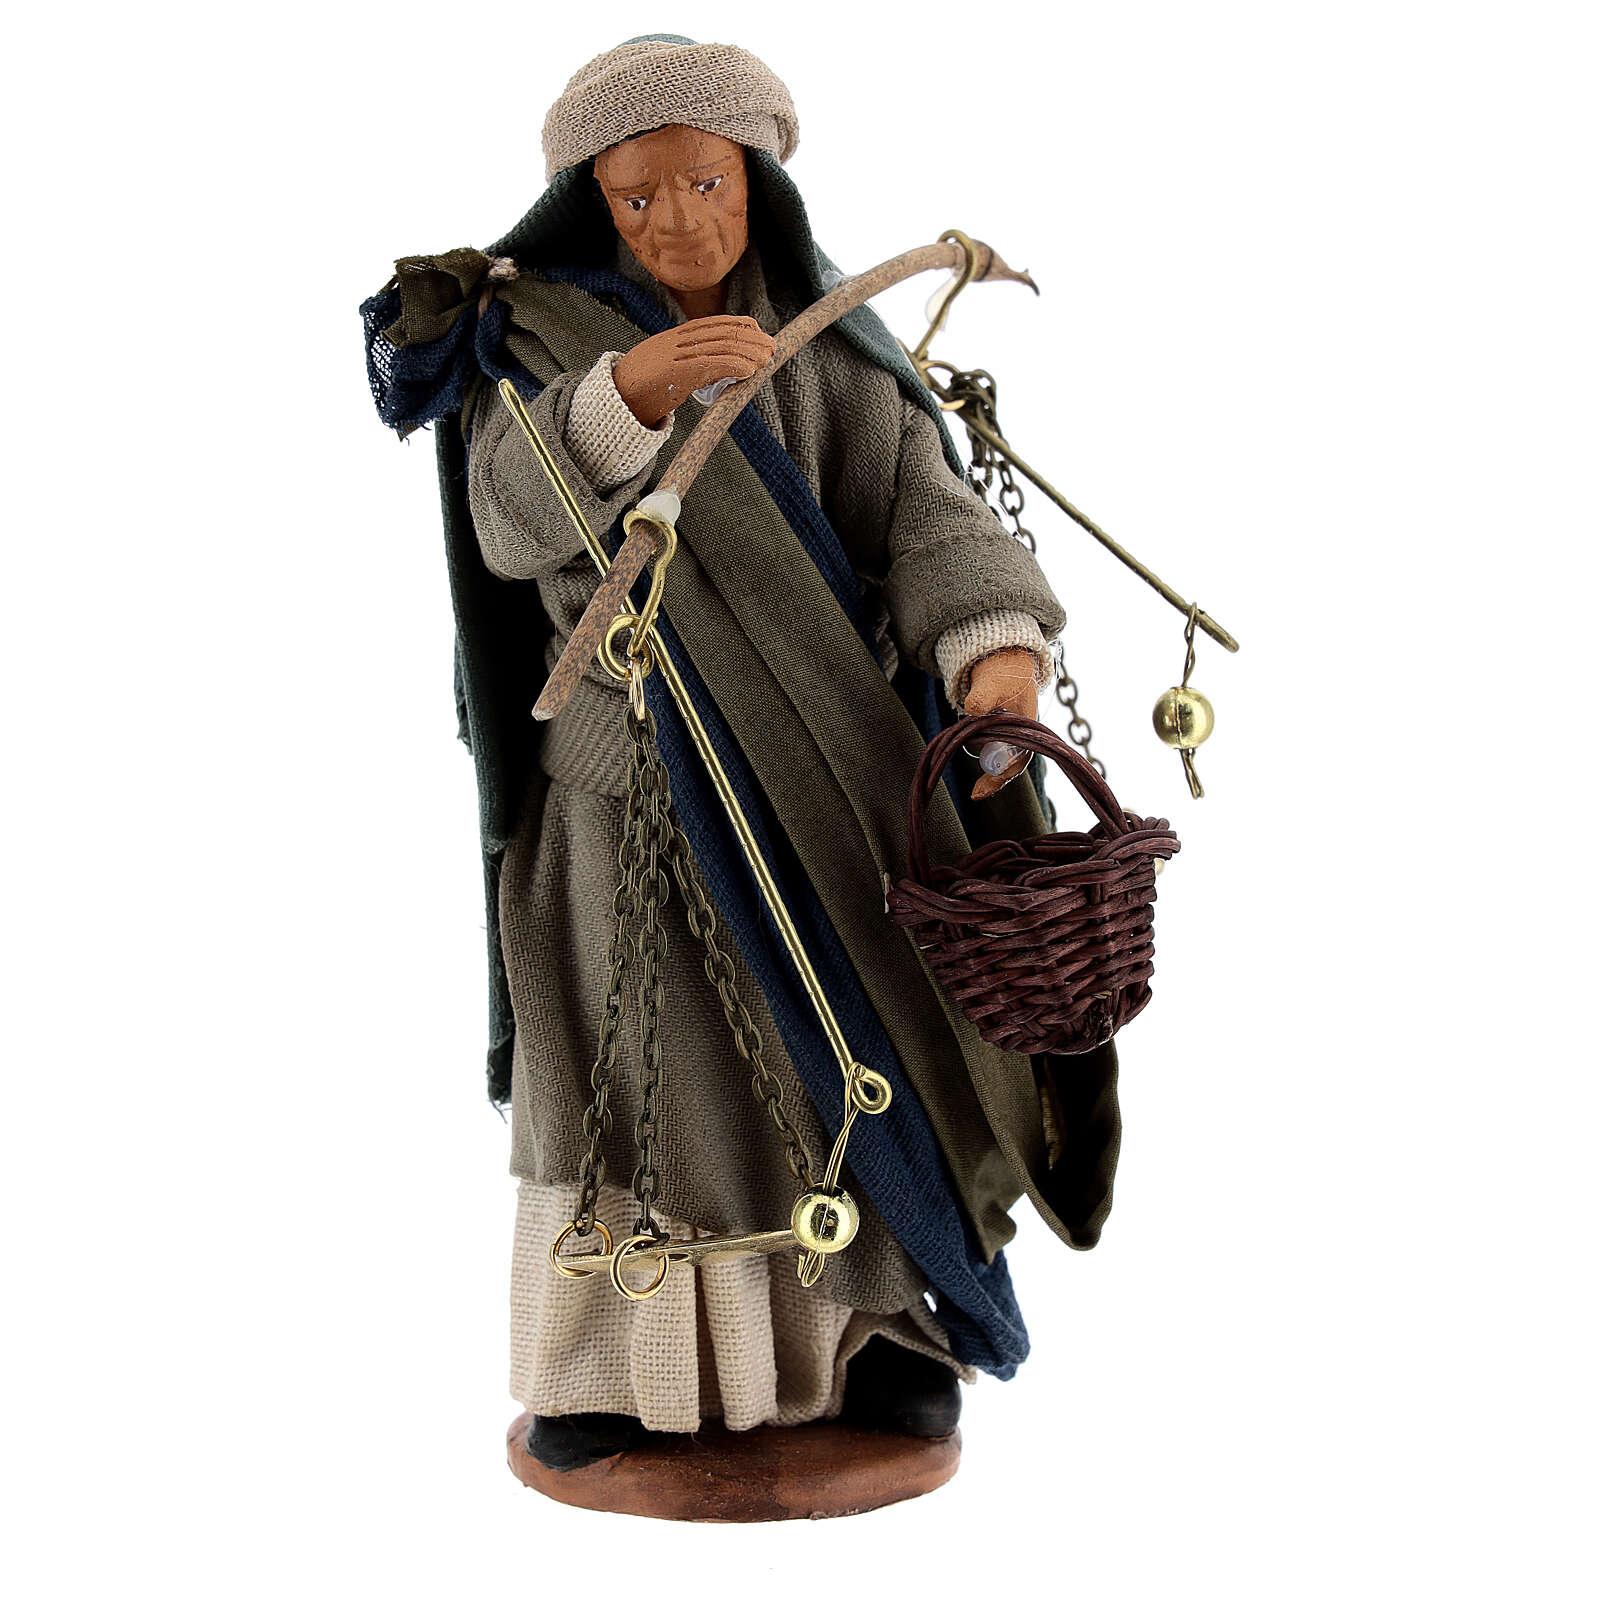 Shepherd with scale and basket Neapolitan nativity scene 13 cm 4